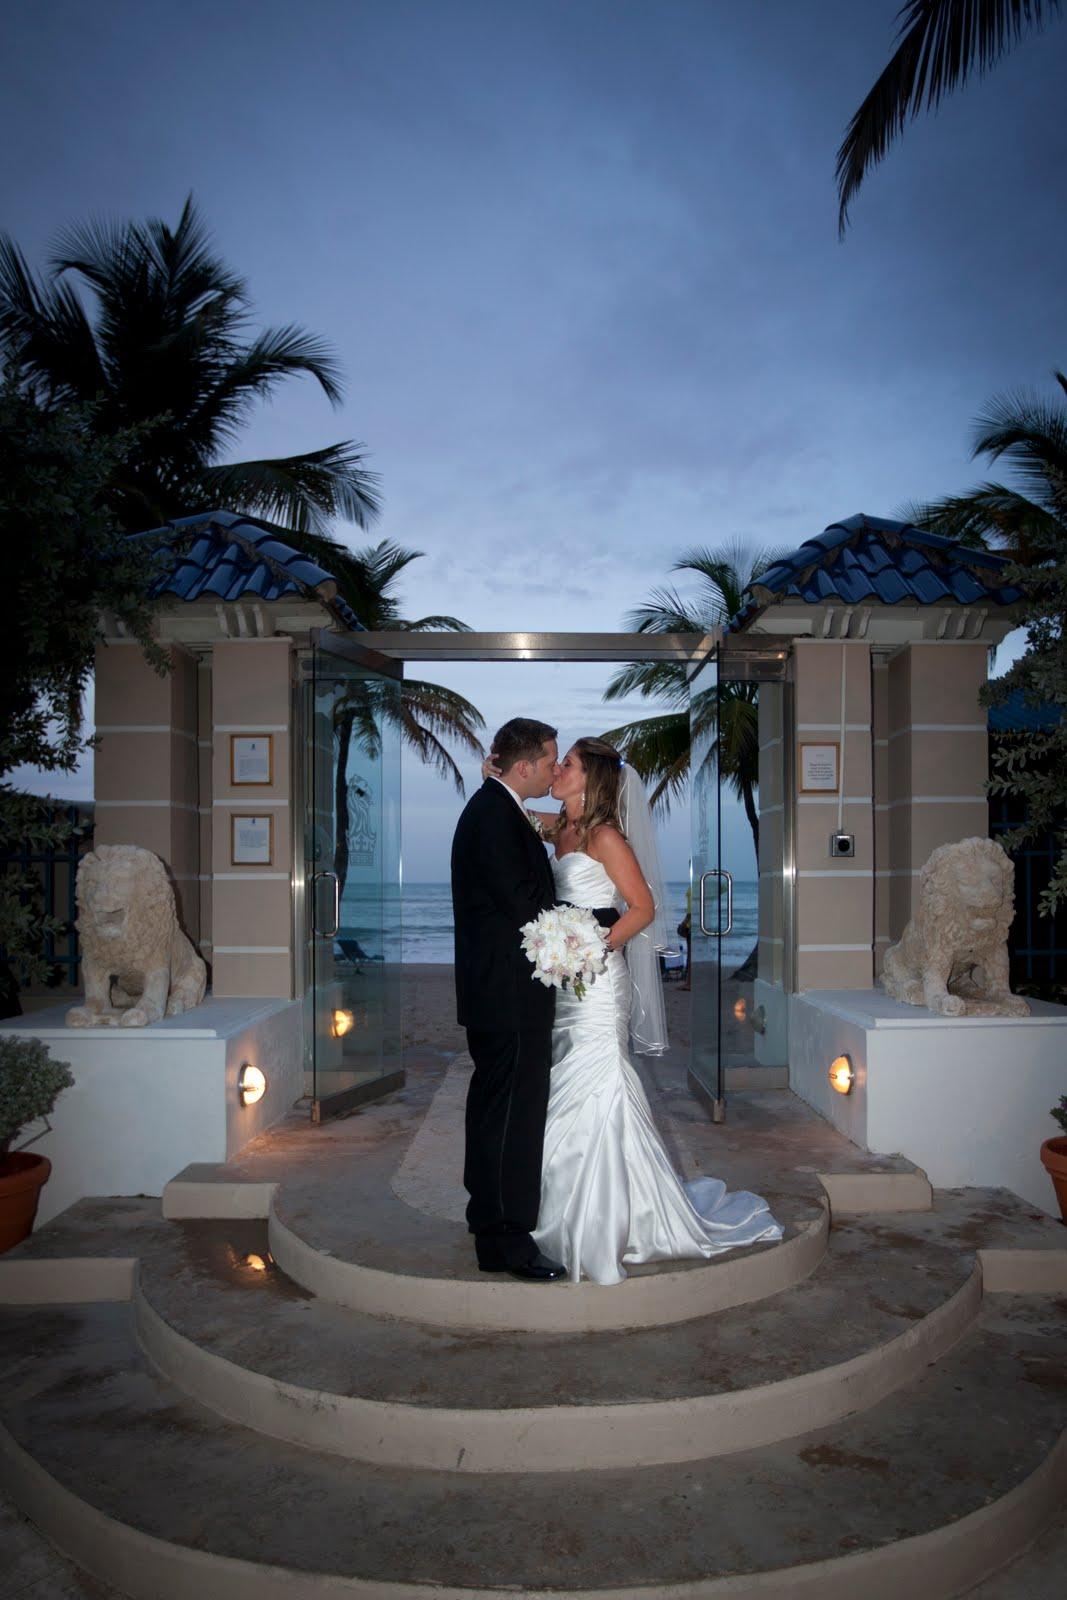 Beach Wedding At Caracoles Area The Ritz Carlton Hotel San Juan Puerto Rico Weddings By Anne Marie Kleis